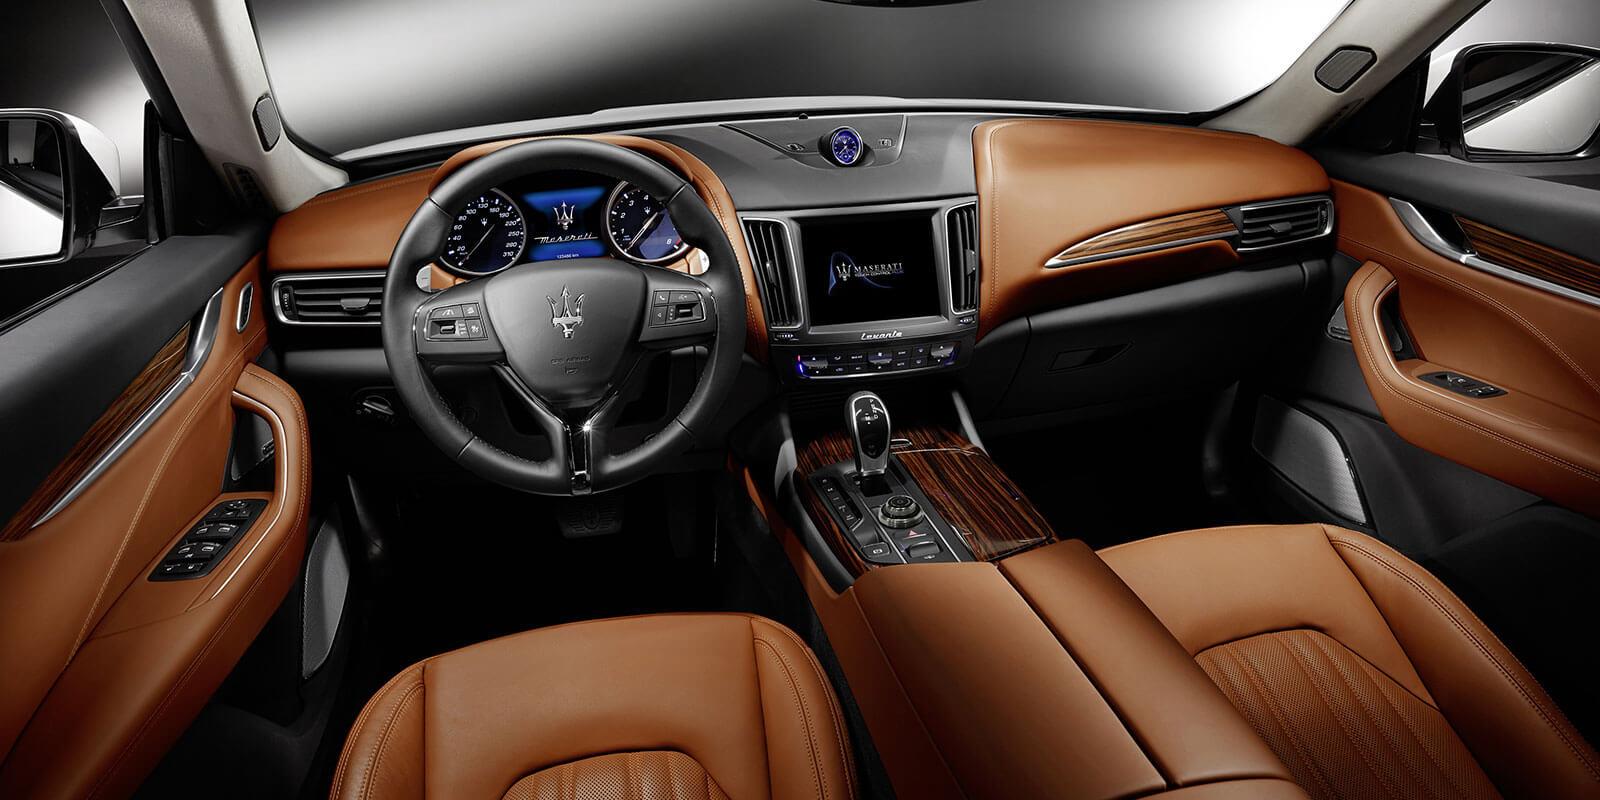 2015 Maserati Quattroporte >> Segment Analysis: Maserati Levante